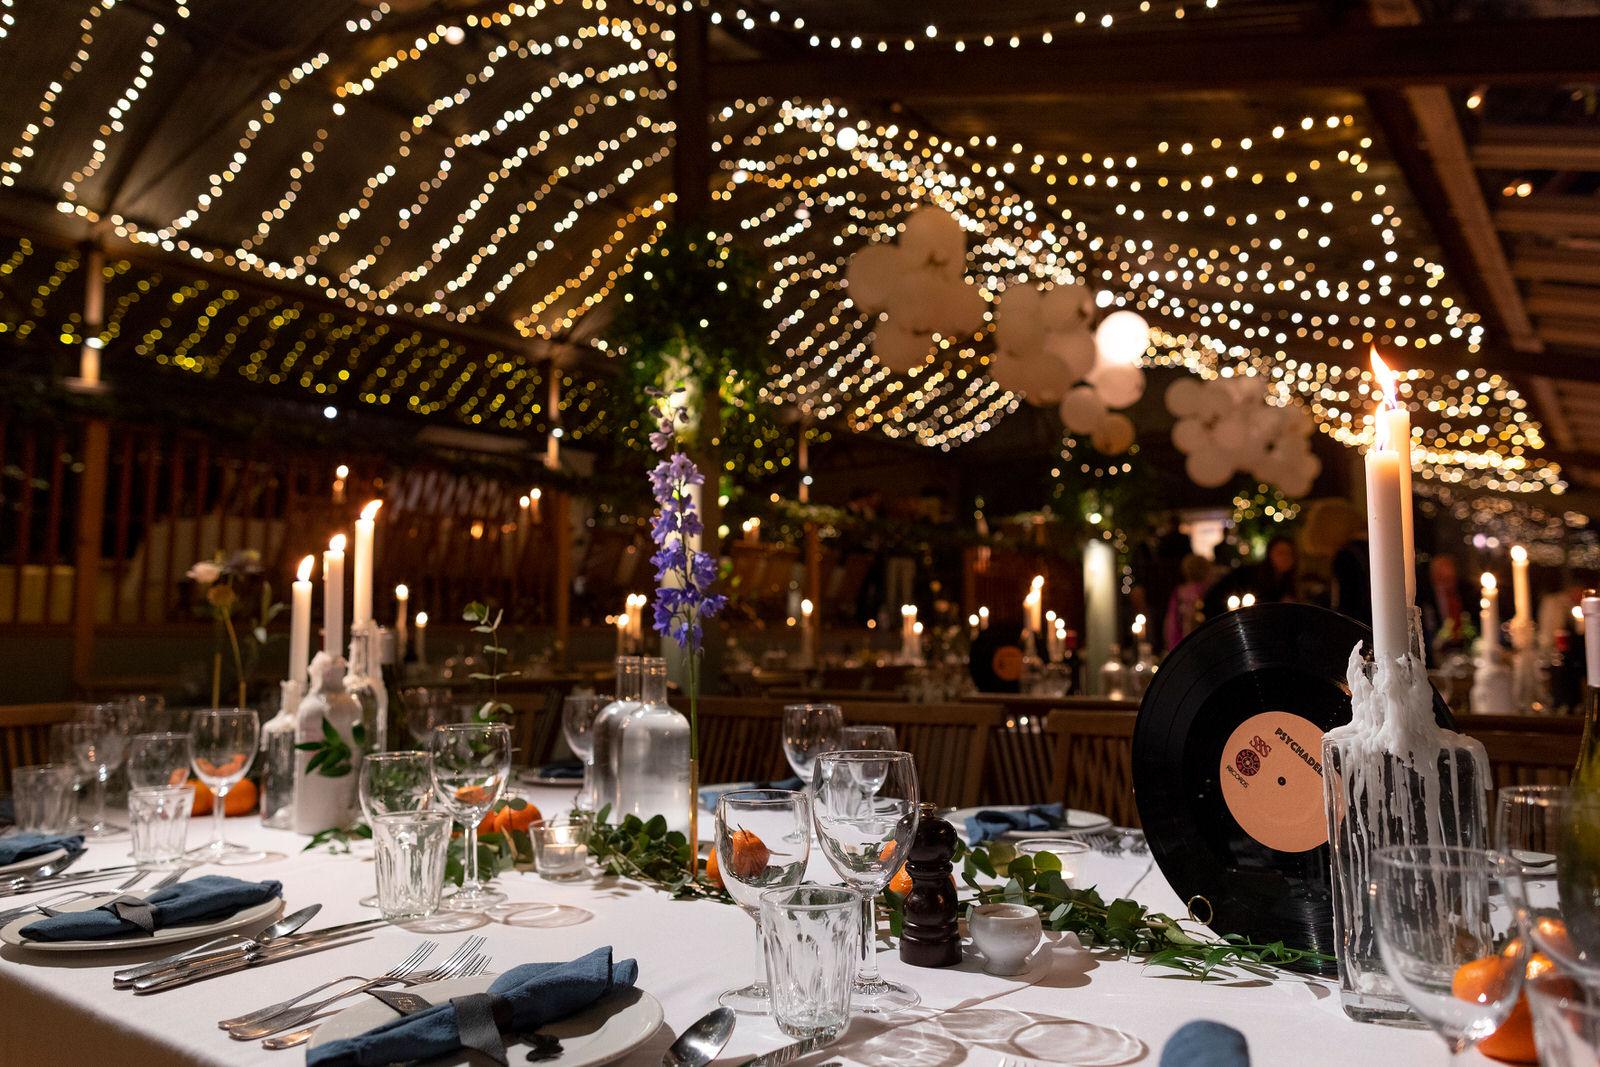 Stone Barn - Al Loves Aida - Sophie & Simon - 28.12.18-sop-sim-stage1-2019-168acopystone+barn+cotswold+wedding+venue.jpg